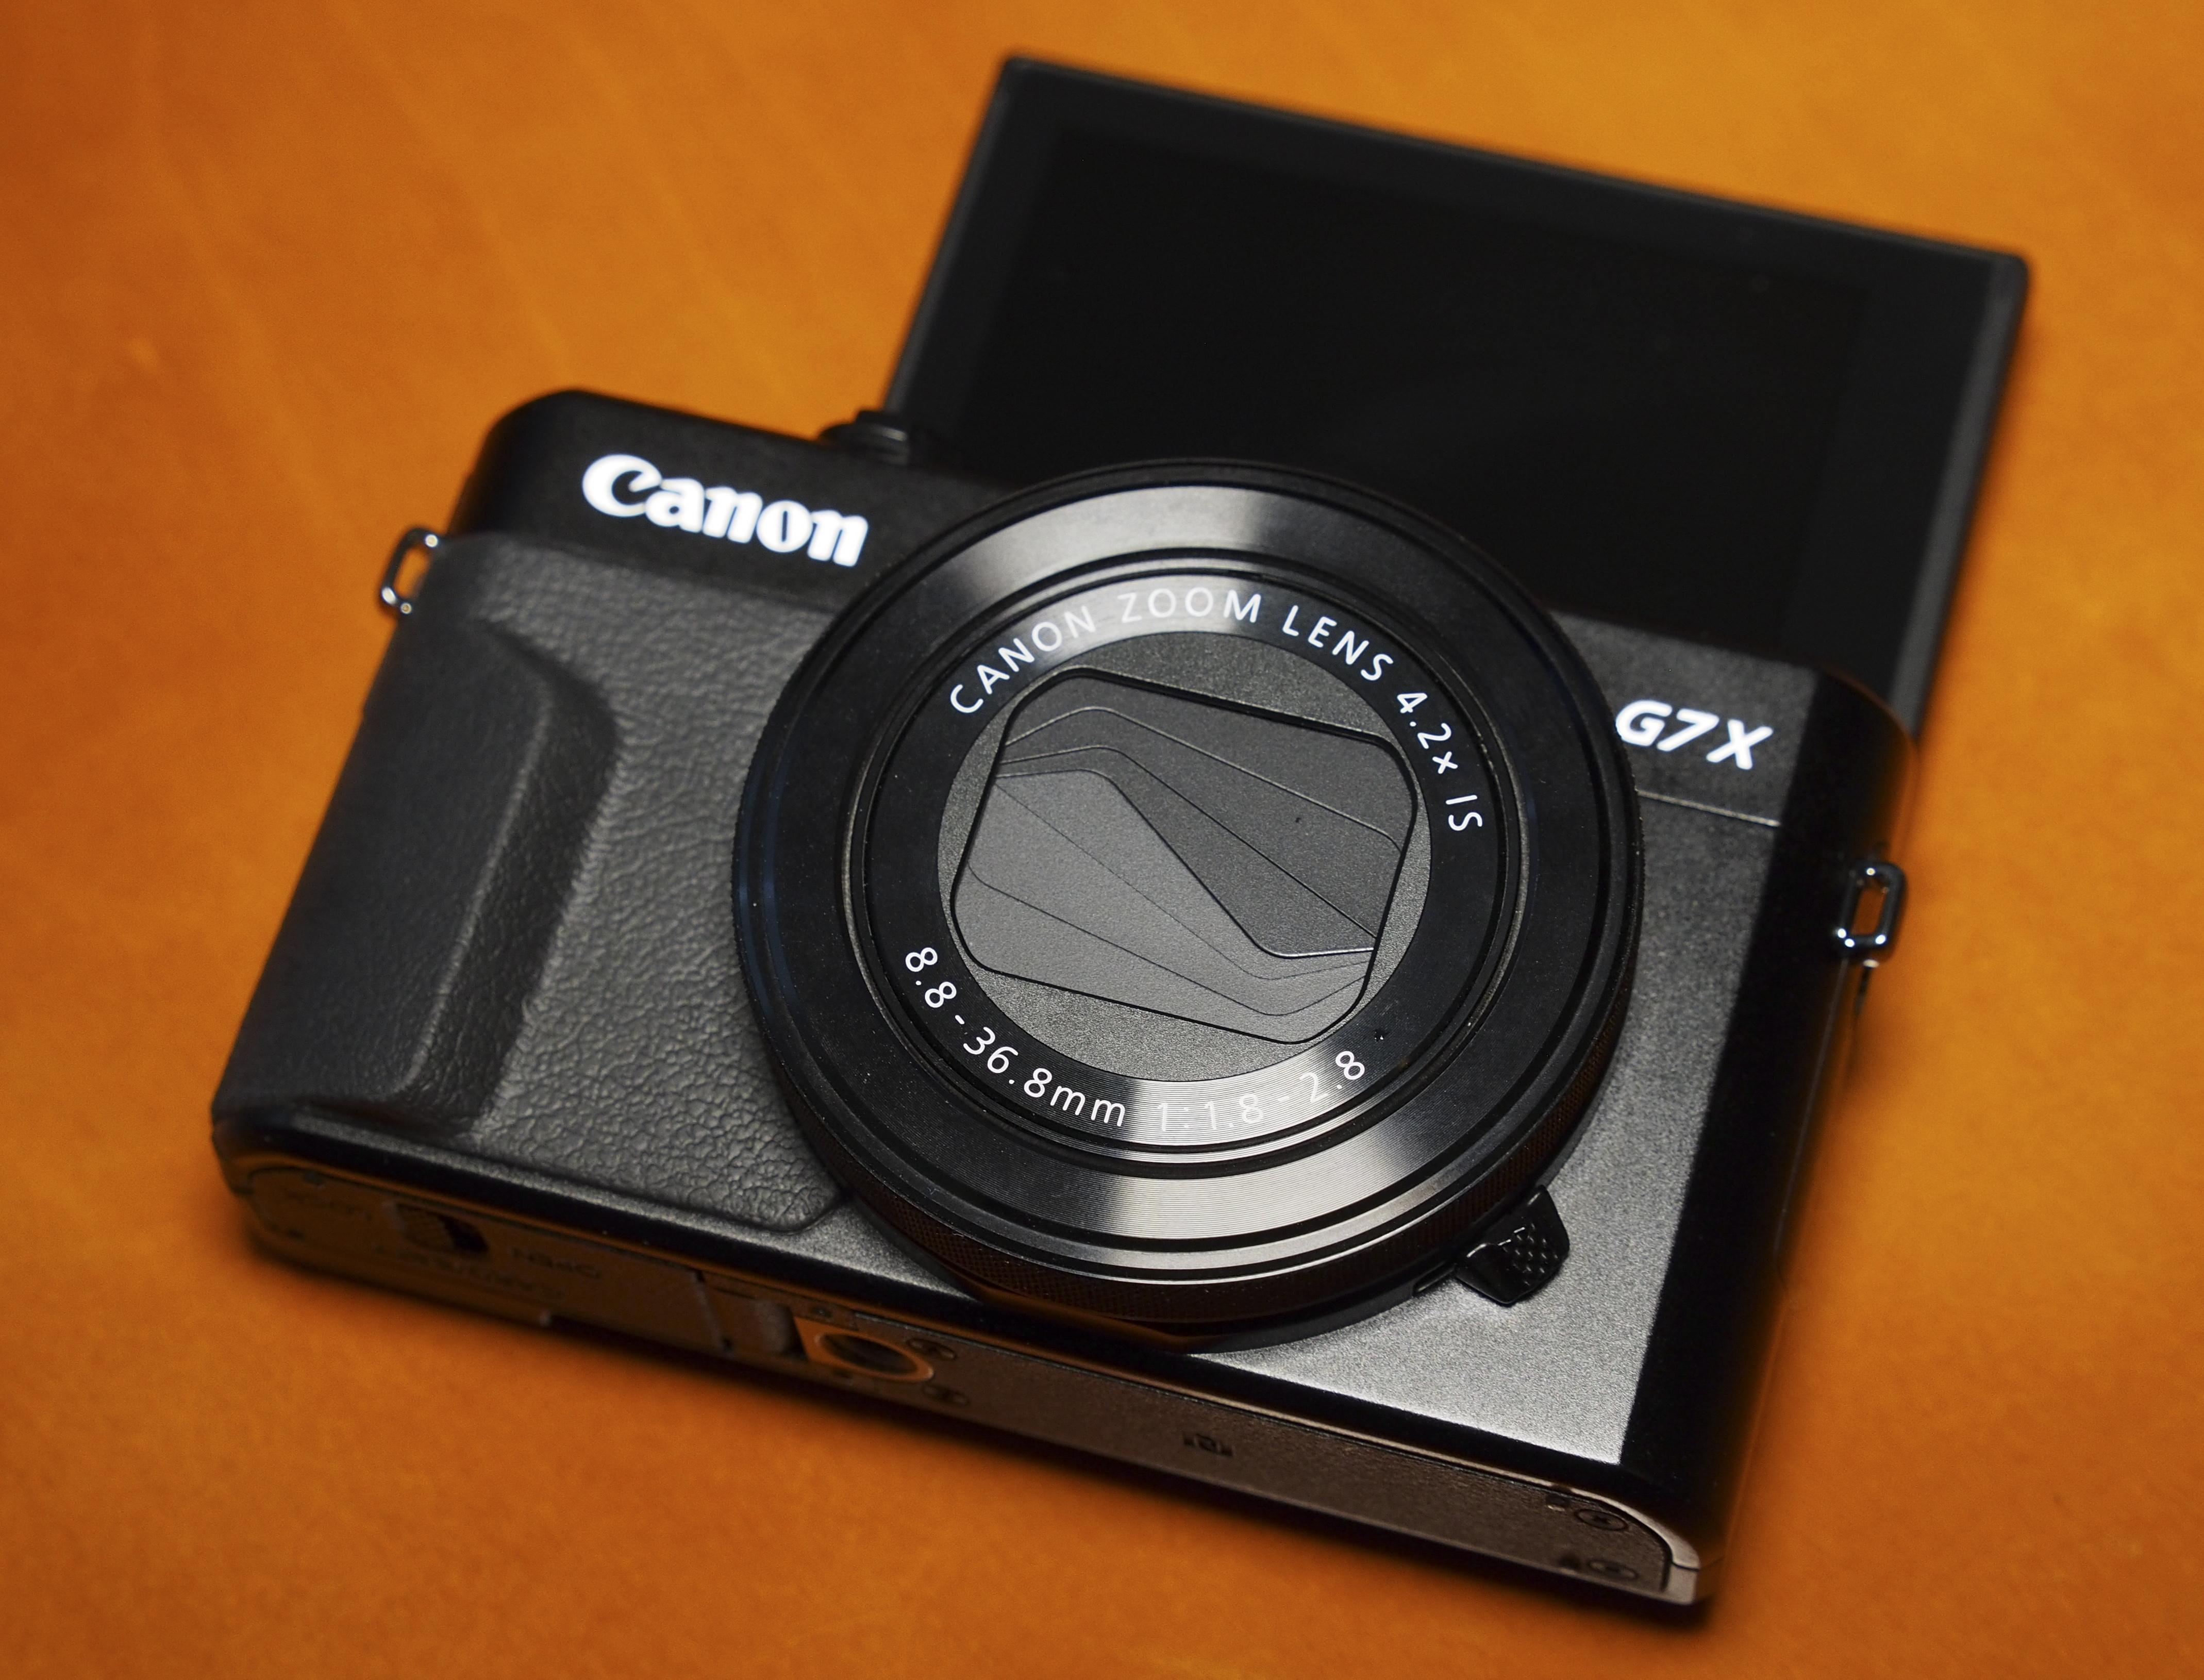 Canon Powershot G7 X Mark II Review | ePHOTOzine